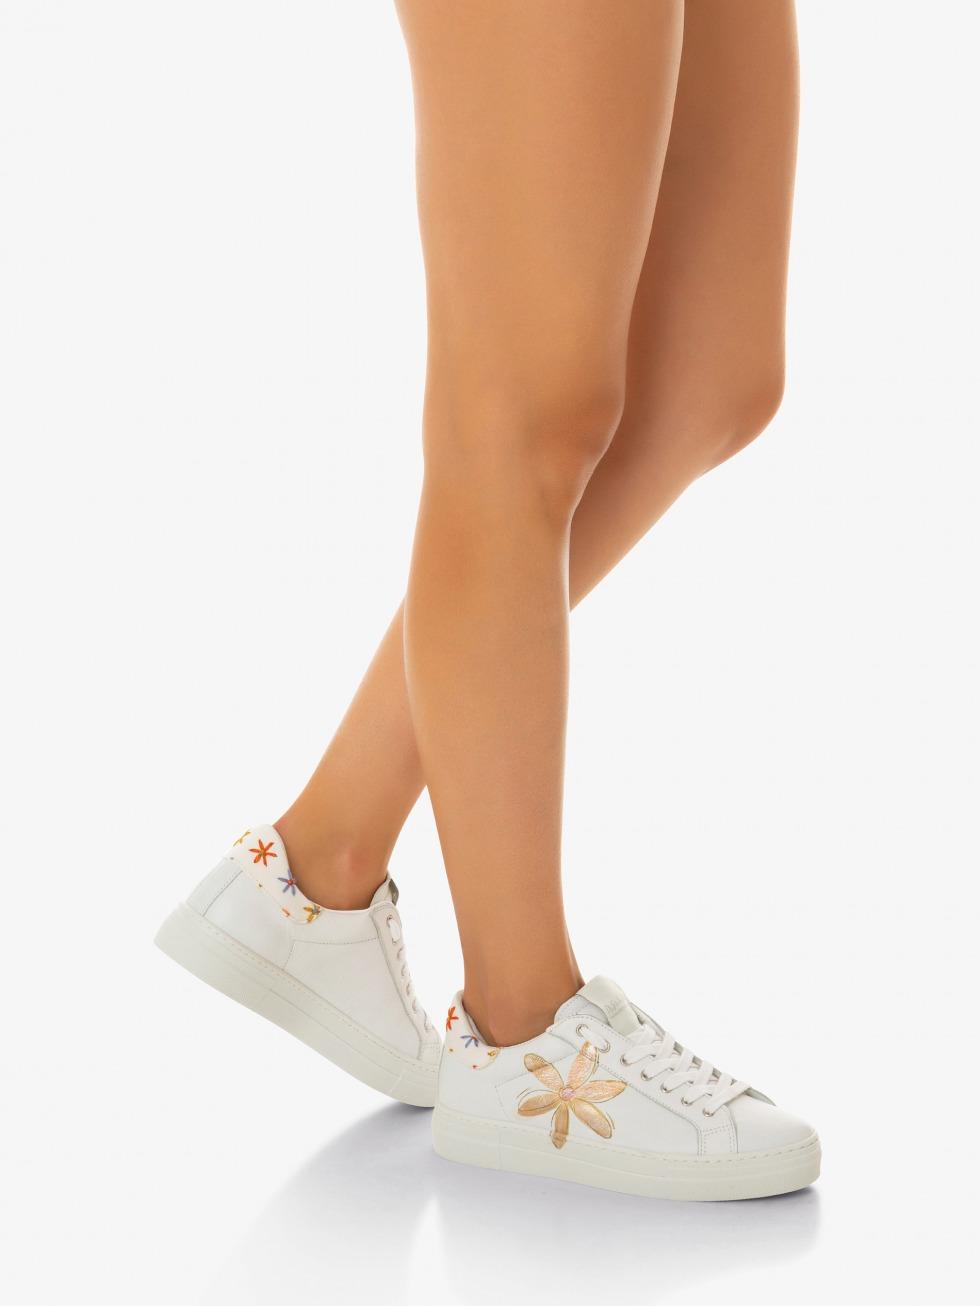 Martini White Sneakers - Flowers